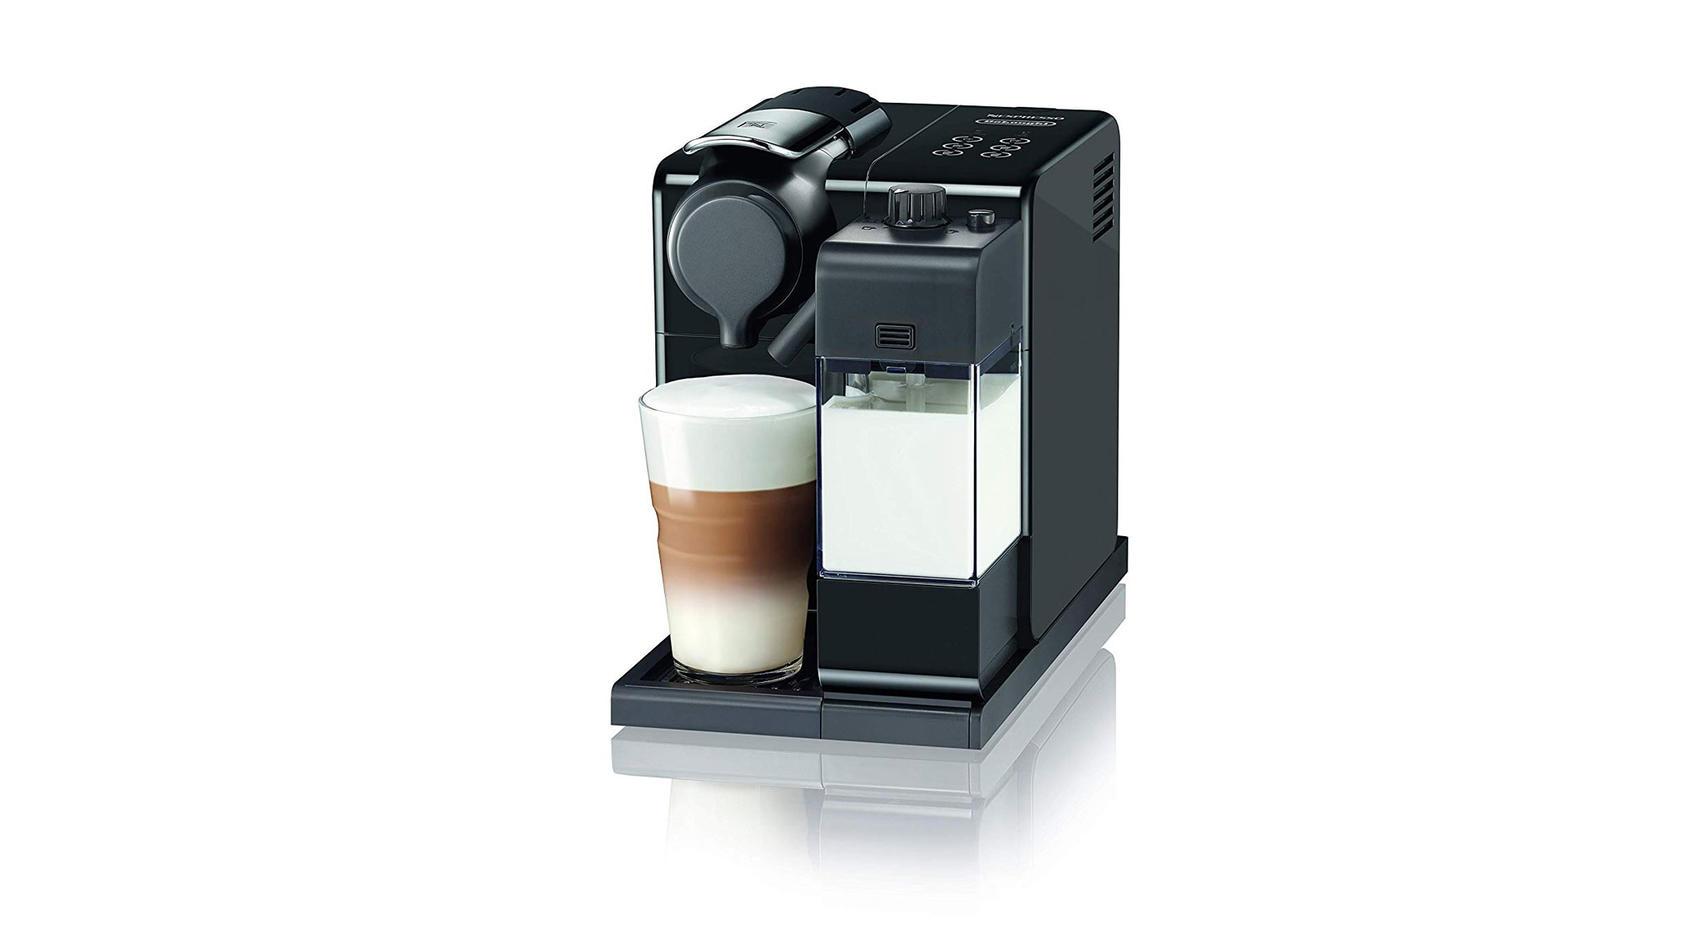 DeLonghi Nespresso Lattissima Touch im Cyber-Monday-Angebot bei Amazon.